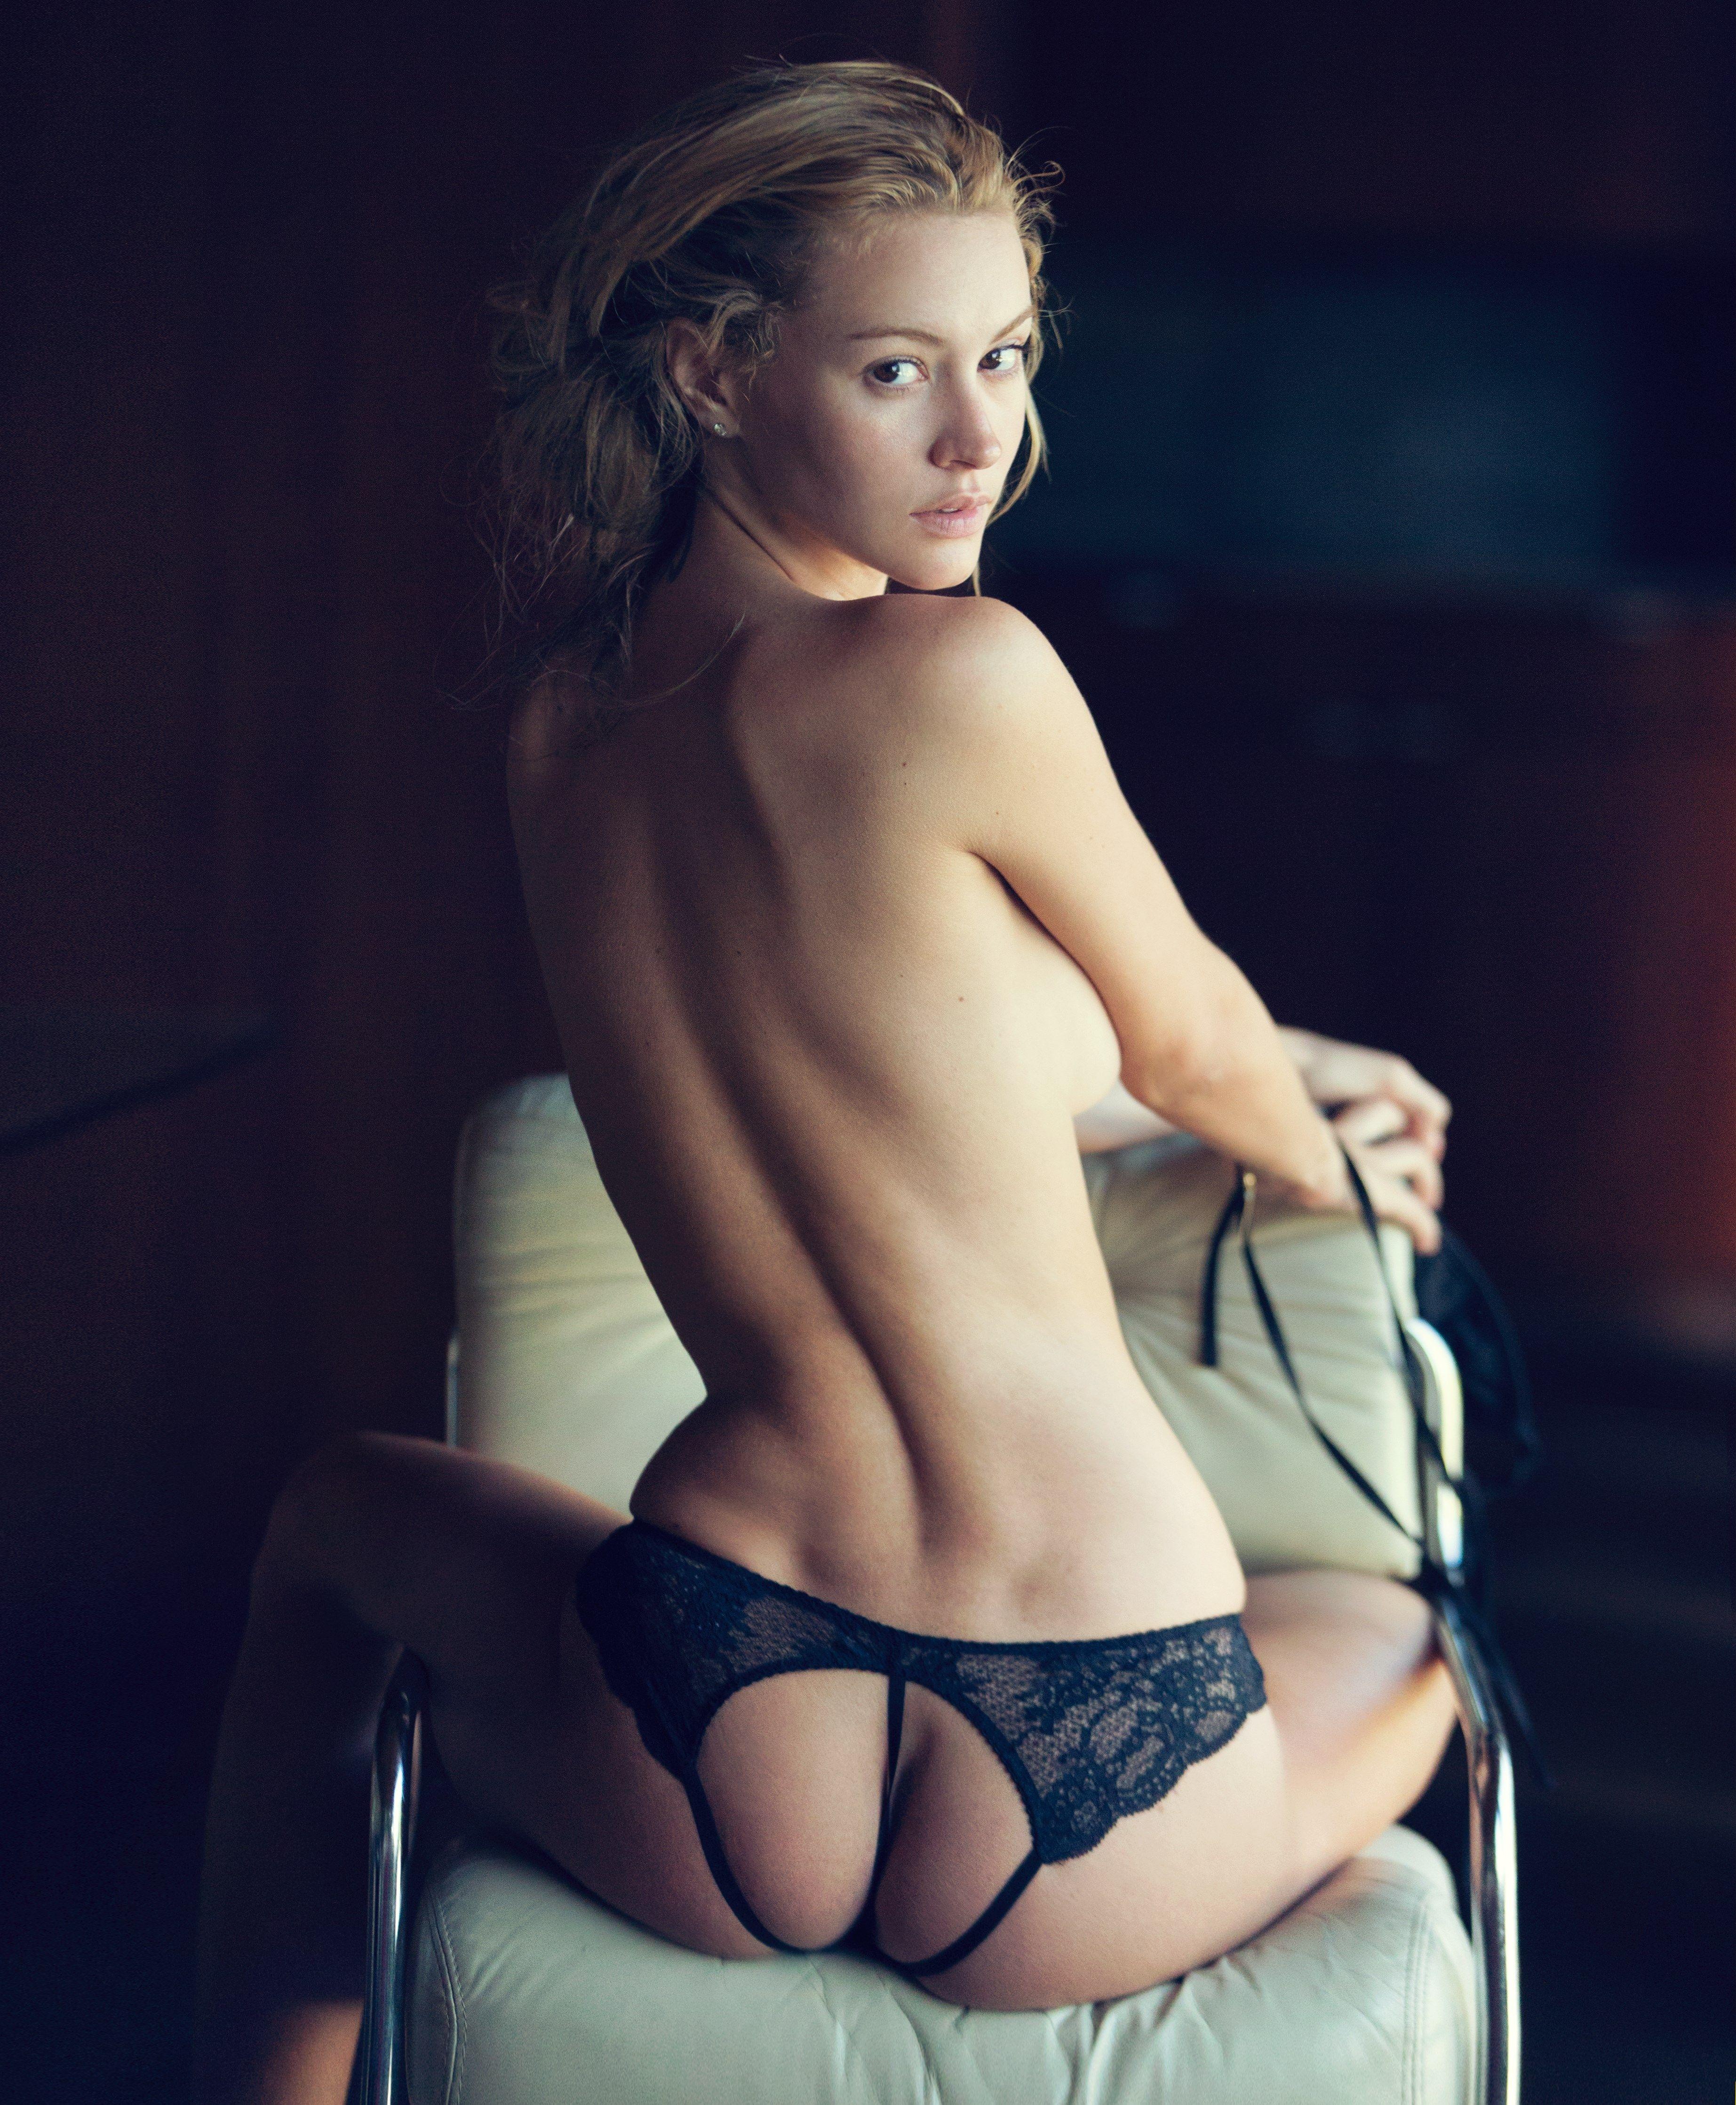 Fuck Brooklynne Young nudes (73 photos), Sexy, Paparazzi, Instagram, in bikini 2015